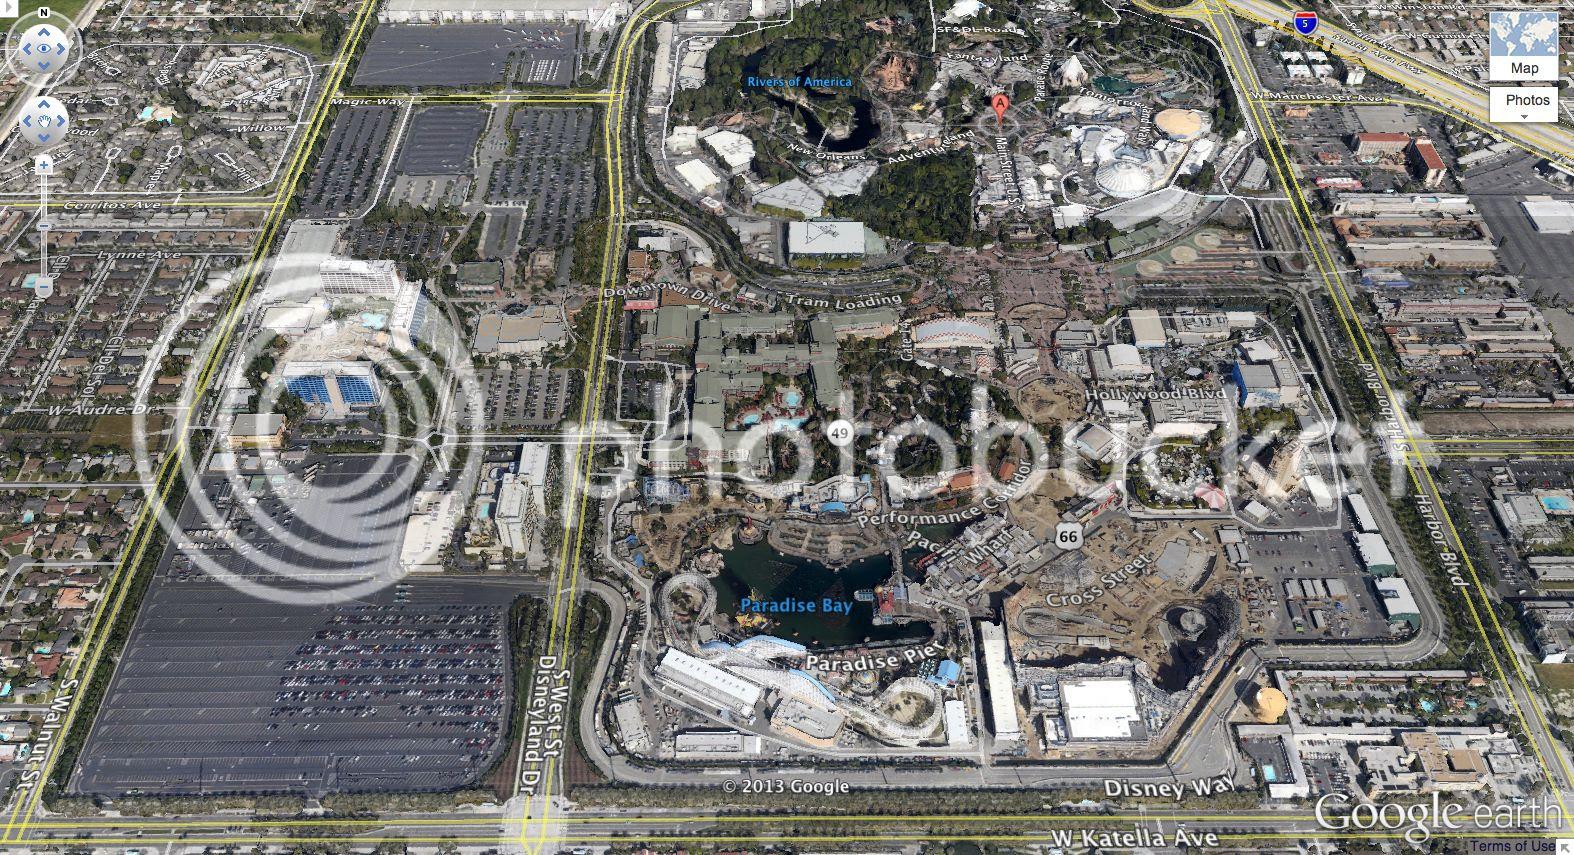 Will Disneyland Star Wars Land Be Built At Disney's California ... on